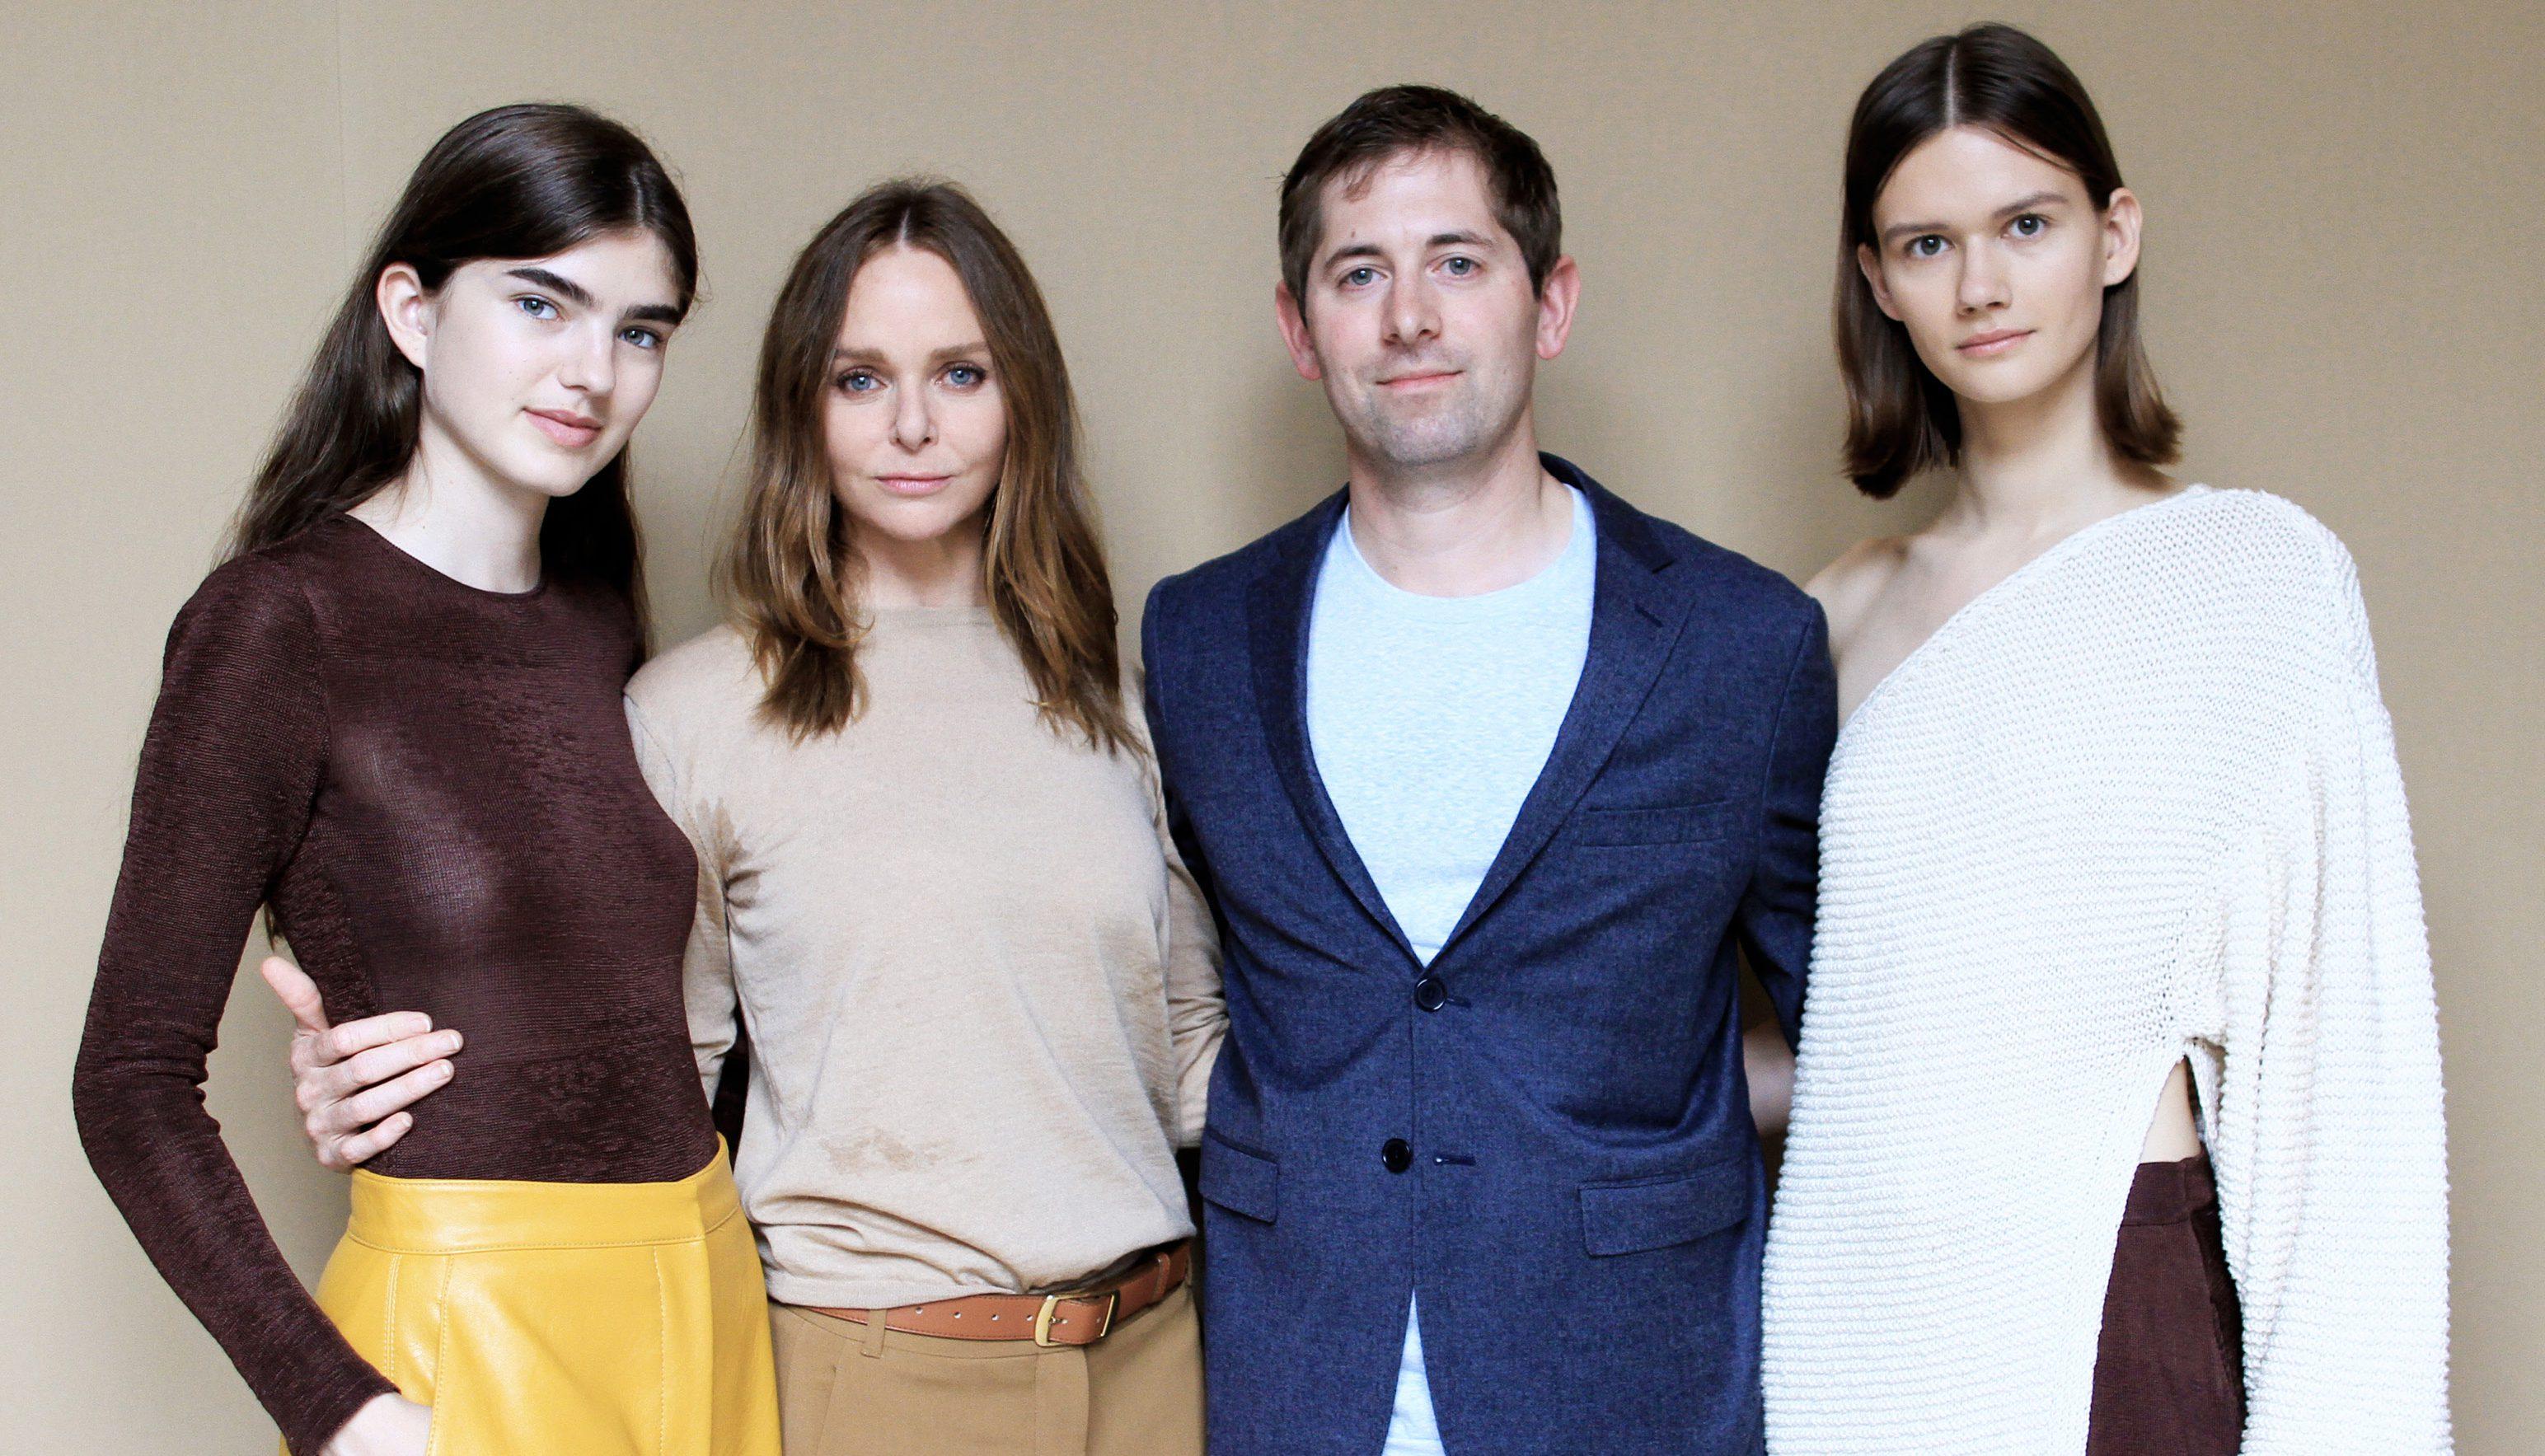 Stella Mccartney S Fashion Line Now Uses High Tech Synthetic Spider Silk Quartz